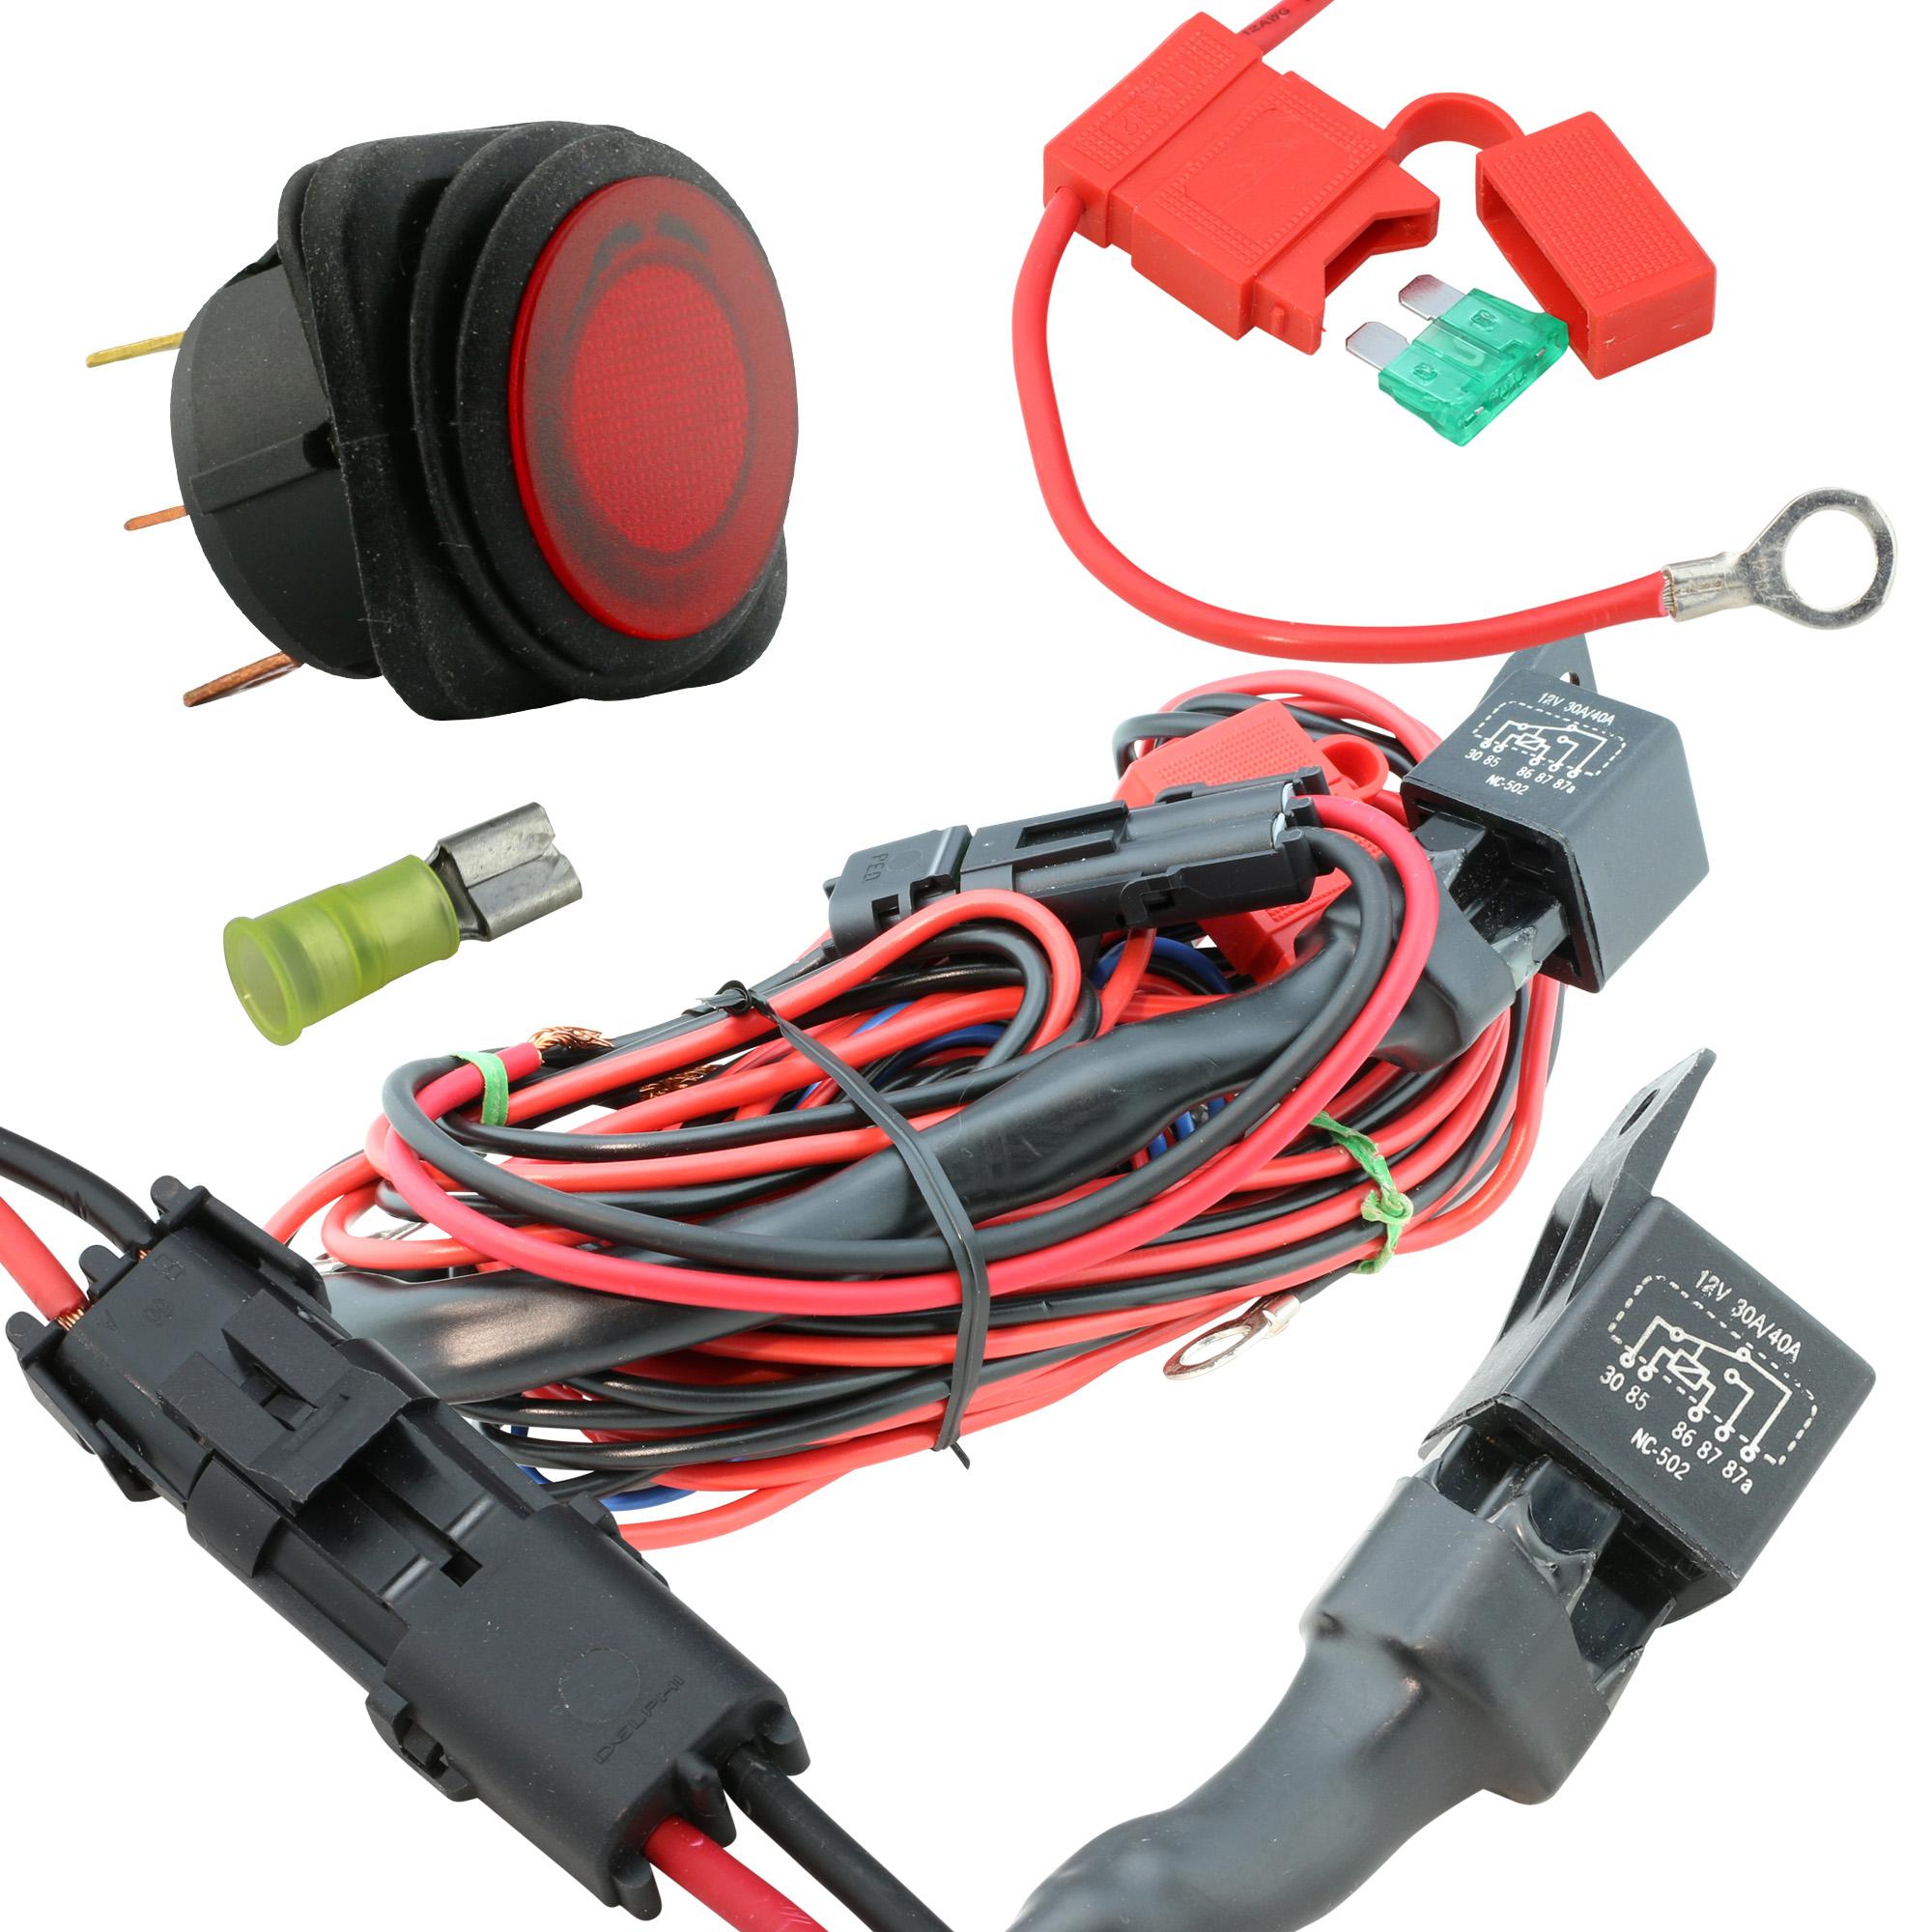 wiring harness walmart wiring image wiring diagram led light bar wiring harness walmart led image on wiring harness walmart